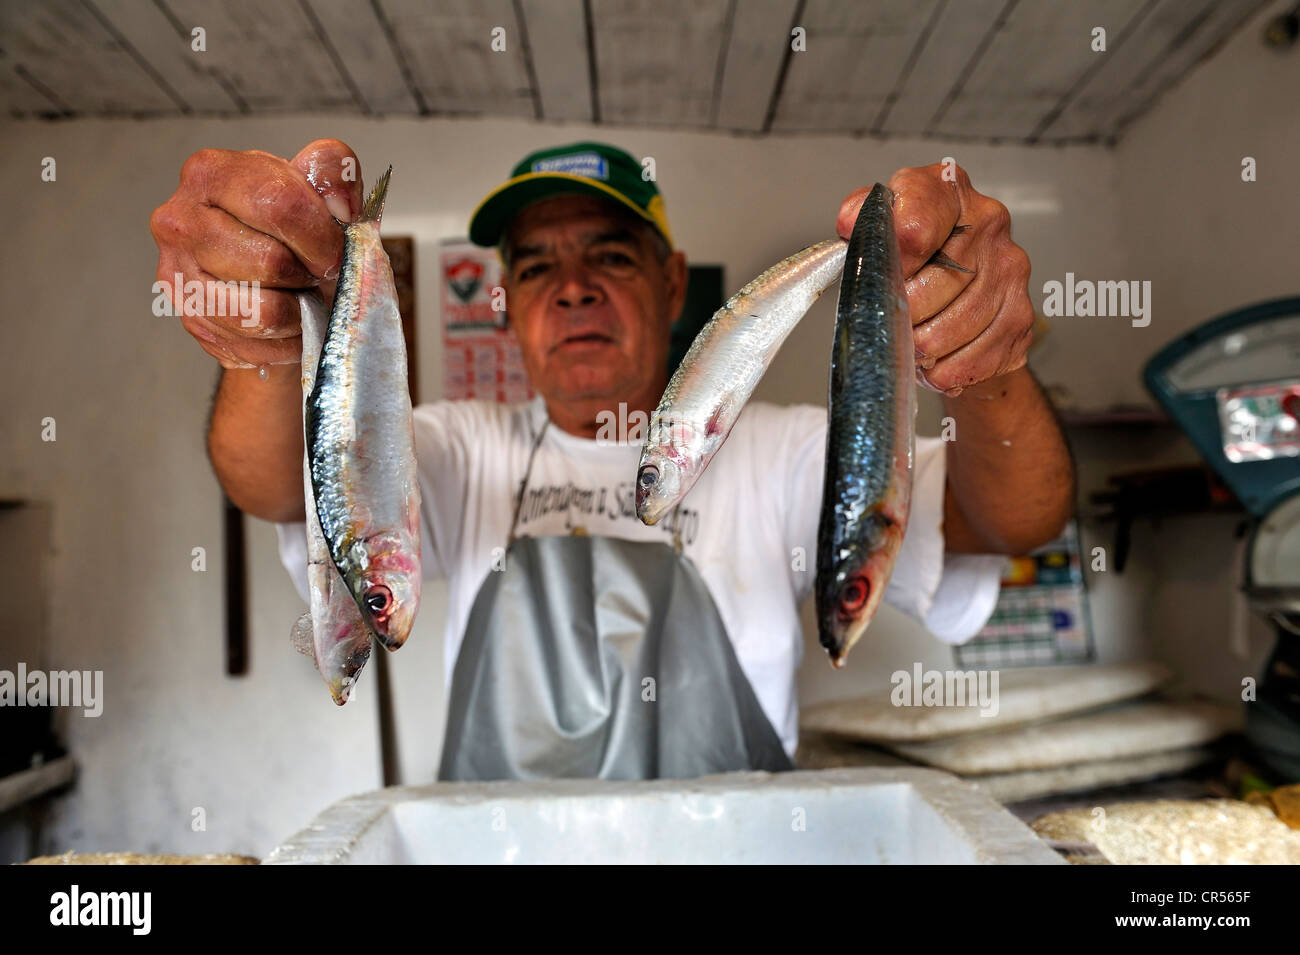 Fishmonger, Pedra de Guaratiba, Sepitiba Bay, Bahia de Sepitiba, Rio de Janeiro, Brazil, South America Stock Photo